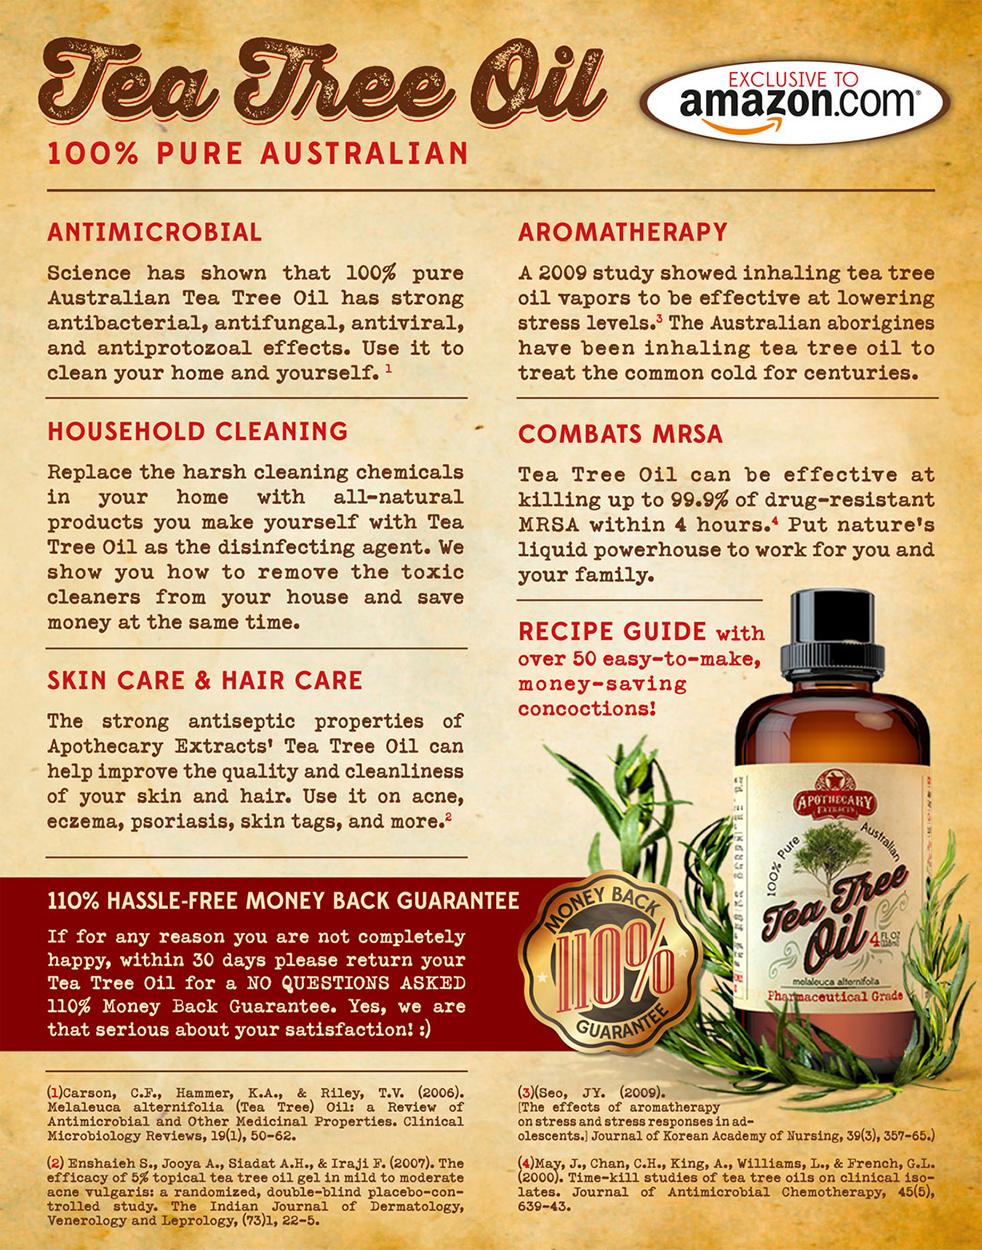 Tea_Tree_Oil_-_product_description.jpg